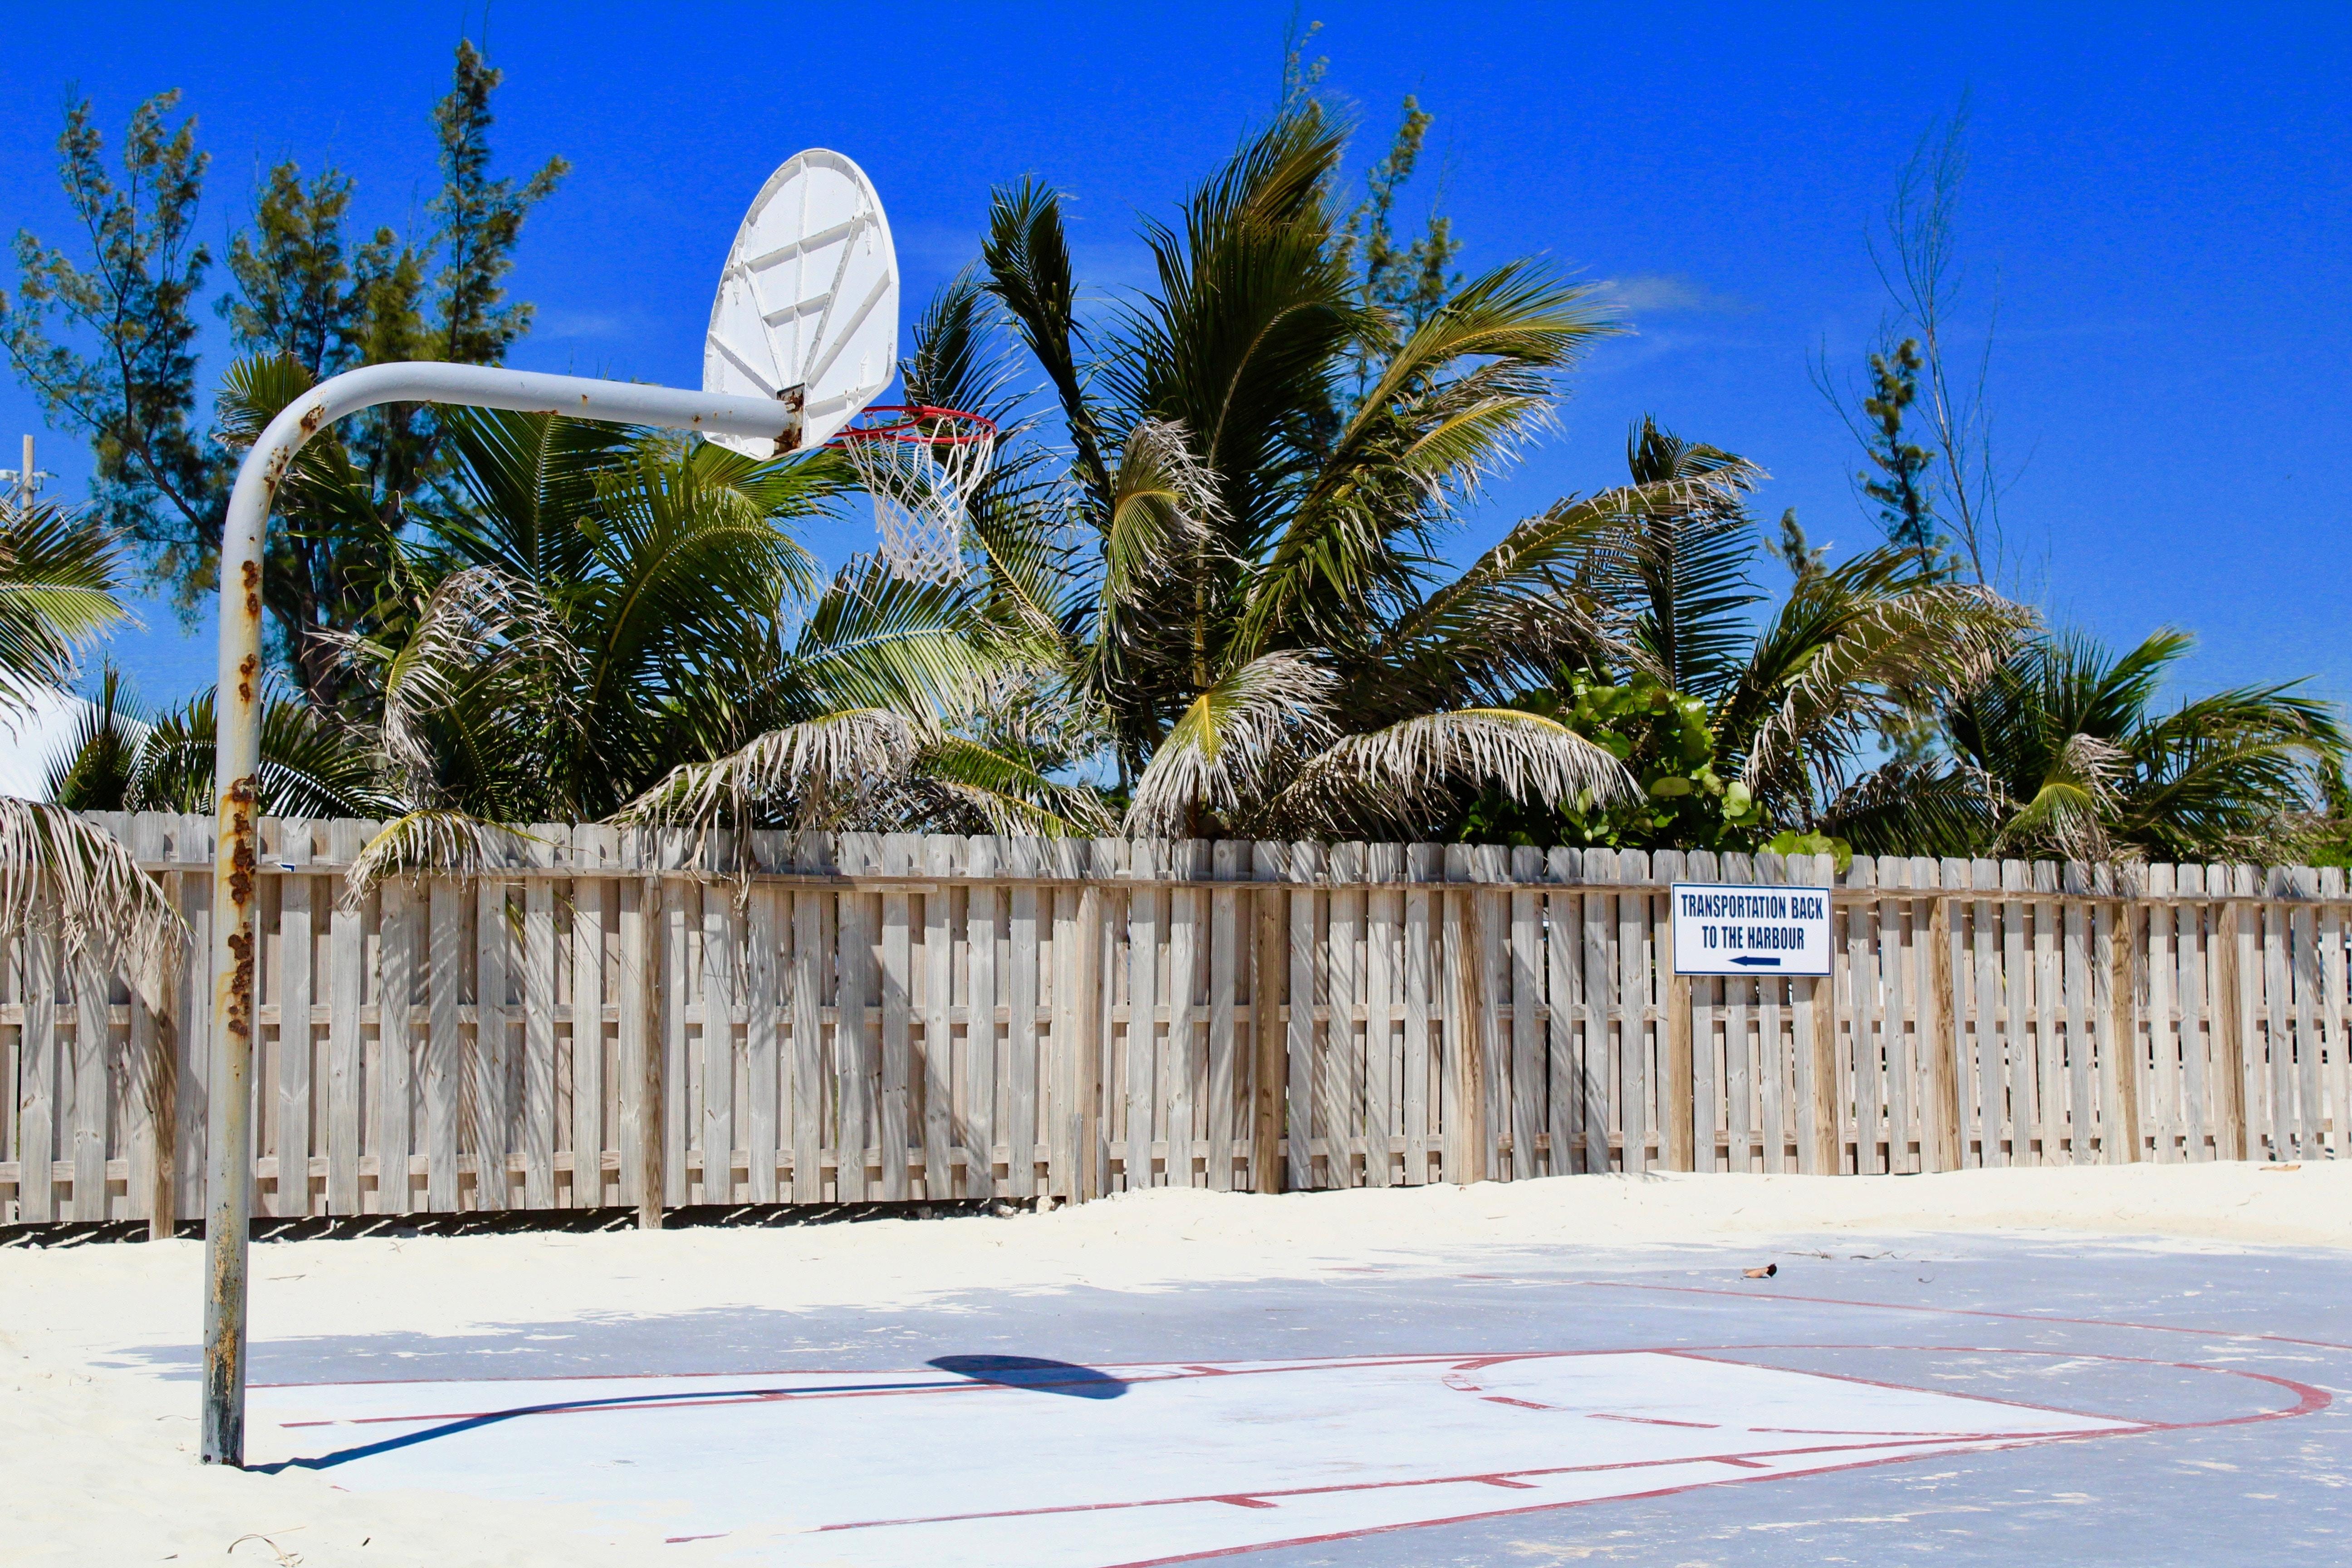 white basketball system